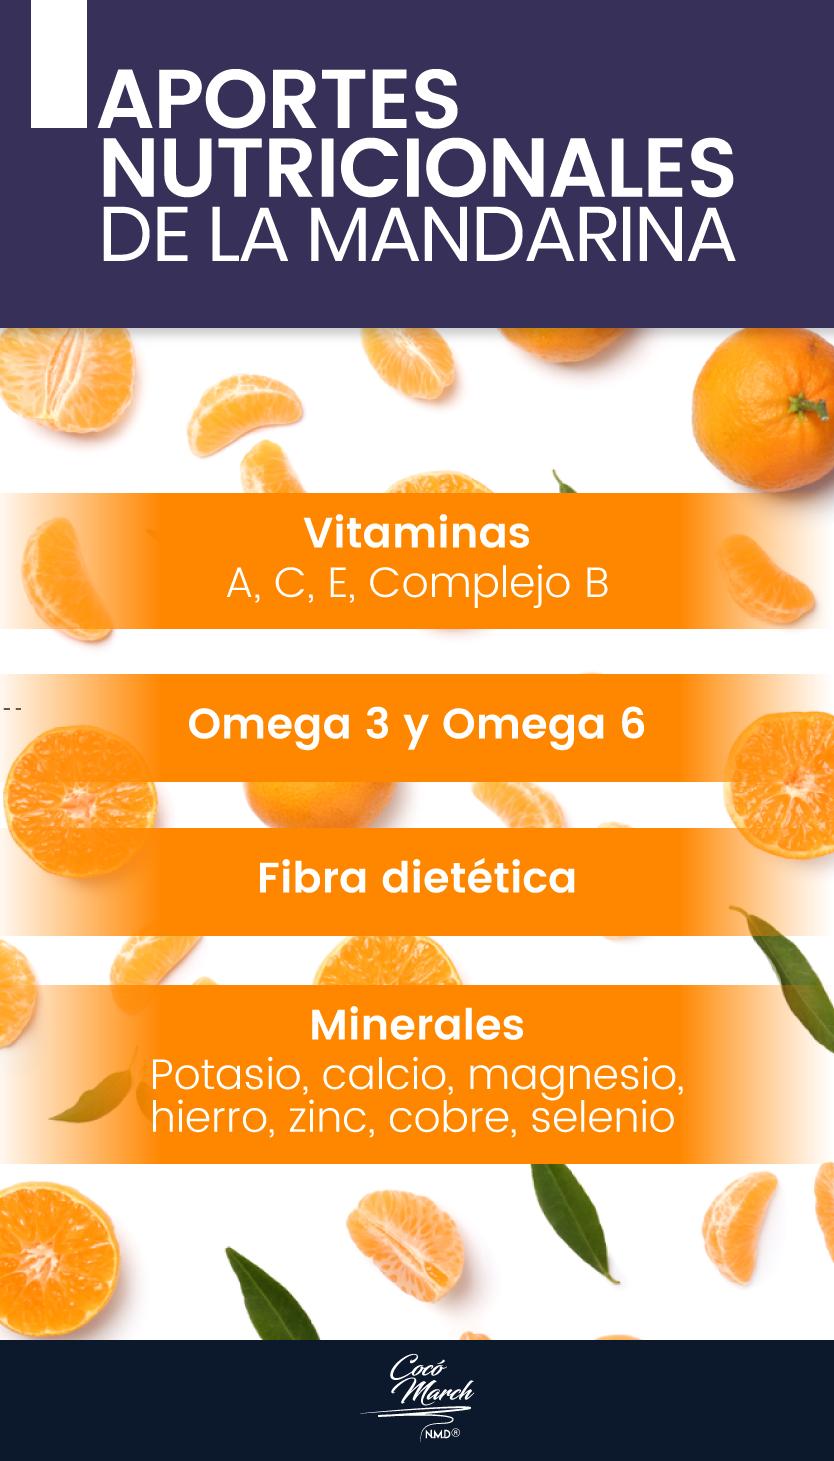 aportes-nutricionales-de-la-mandarina